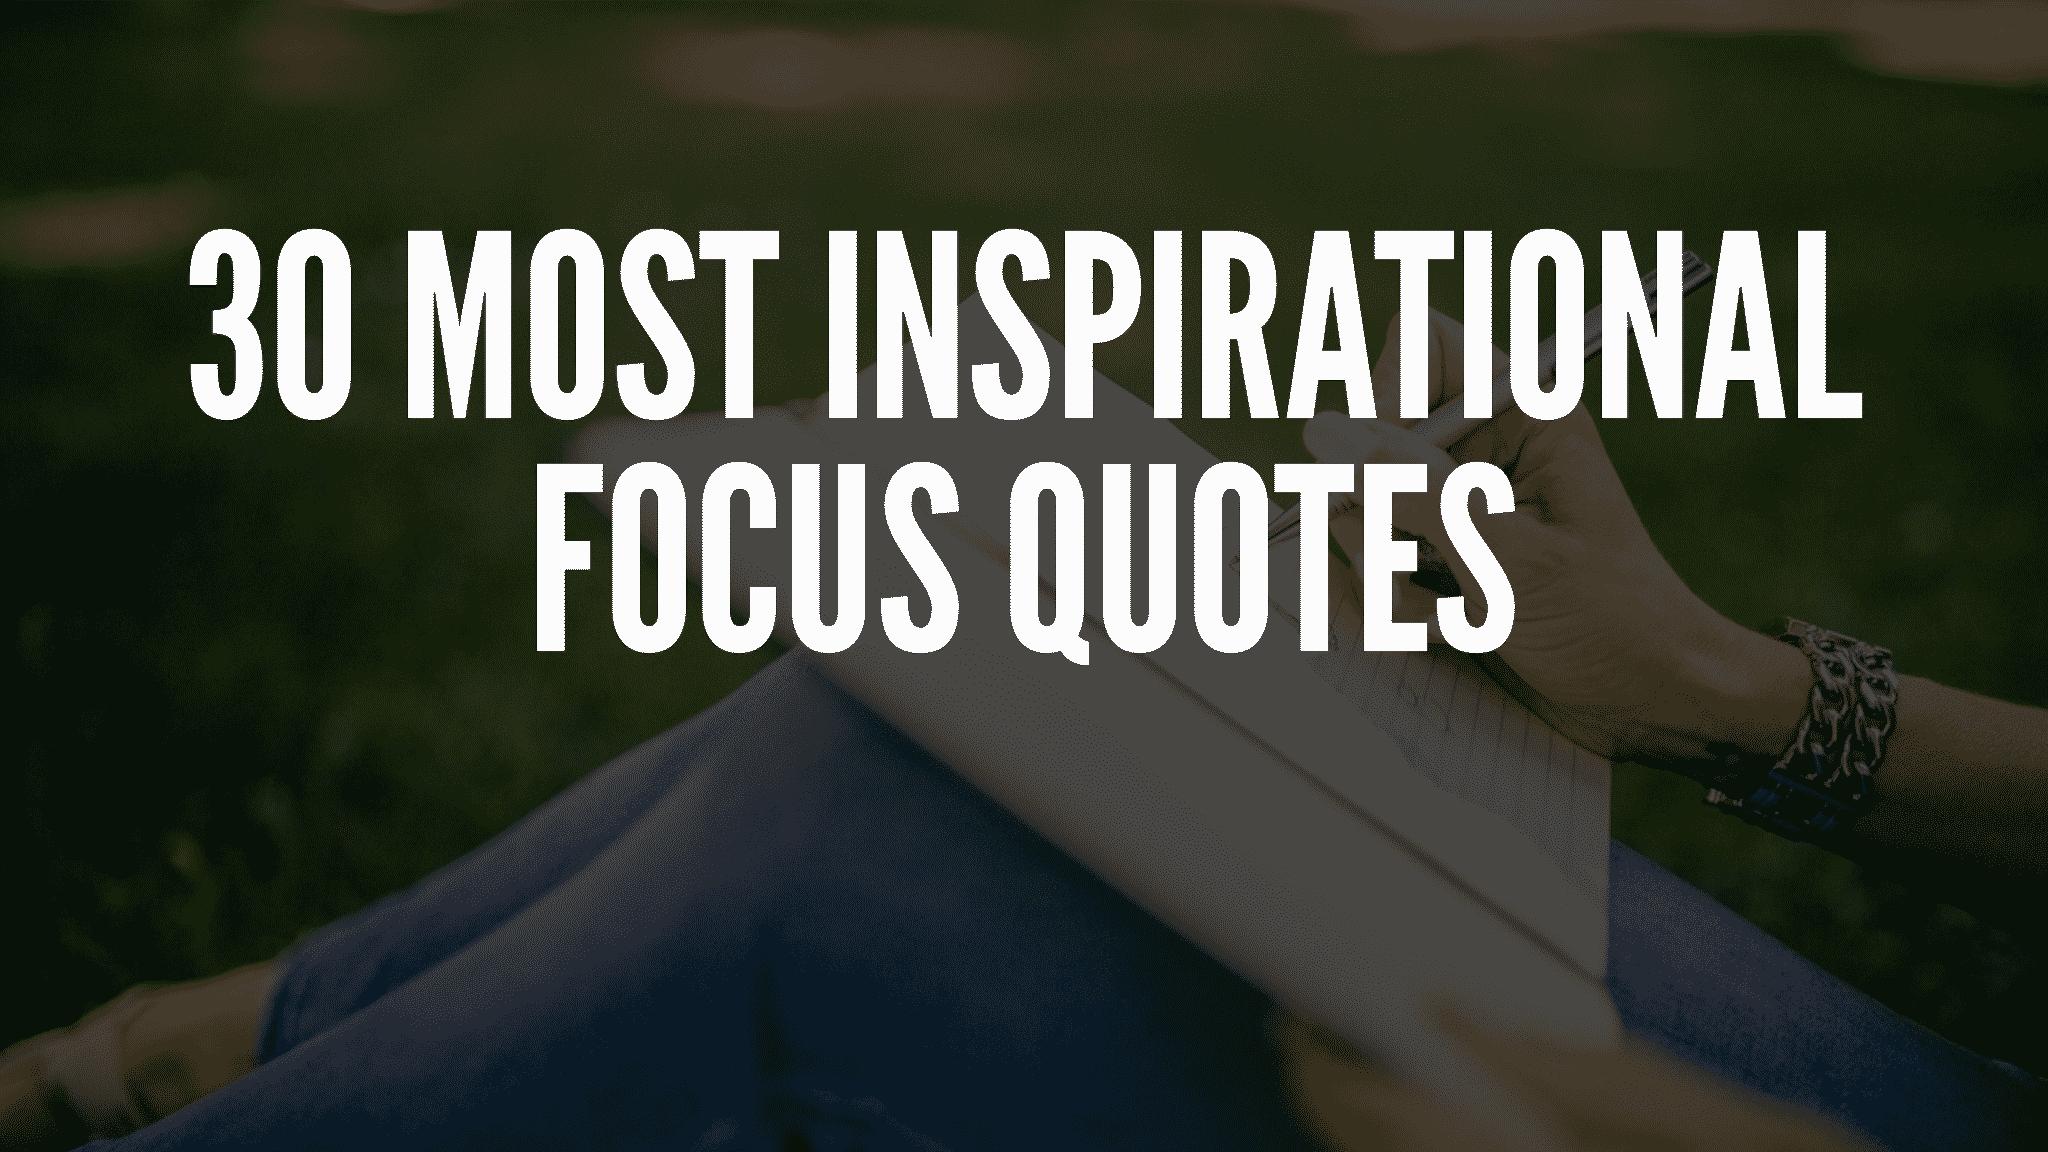 30 Most Inspirational Focus Quotes